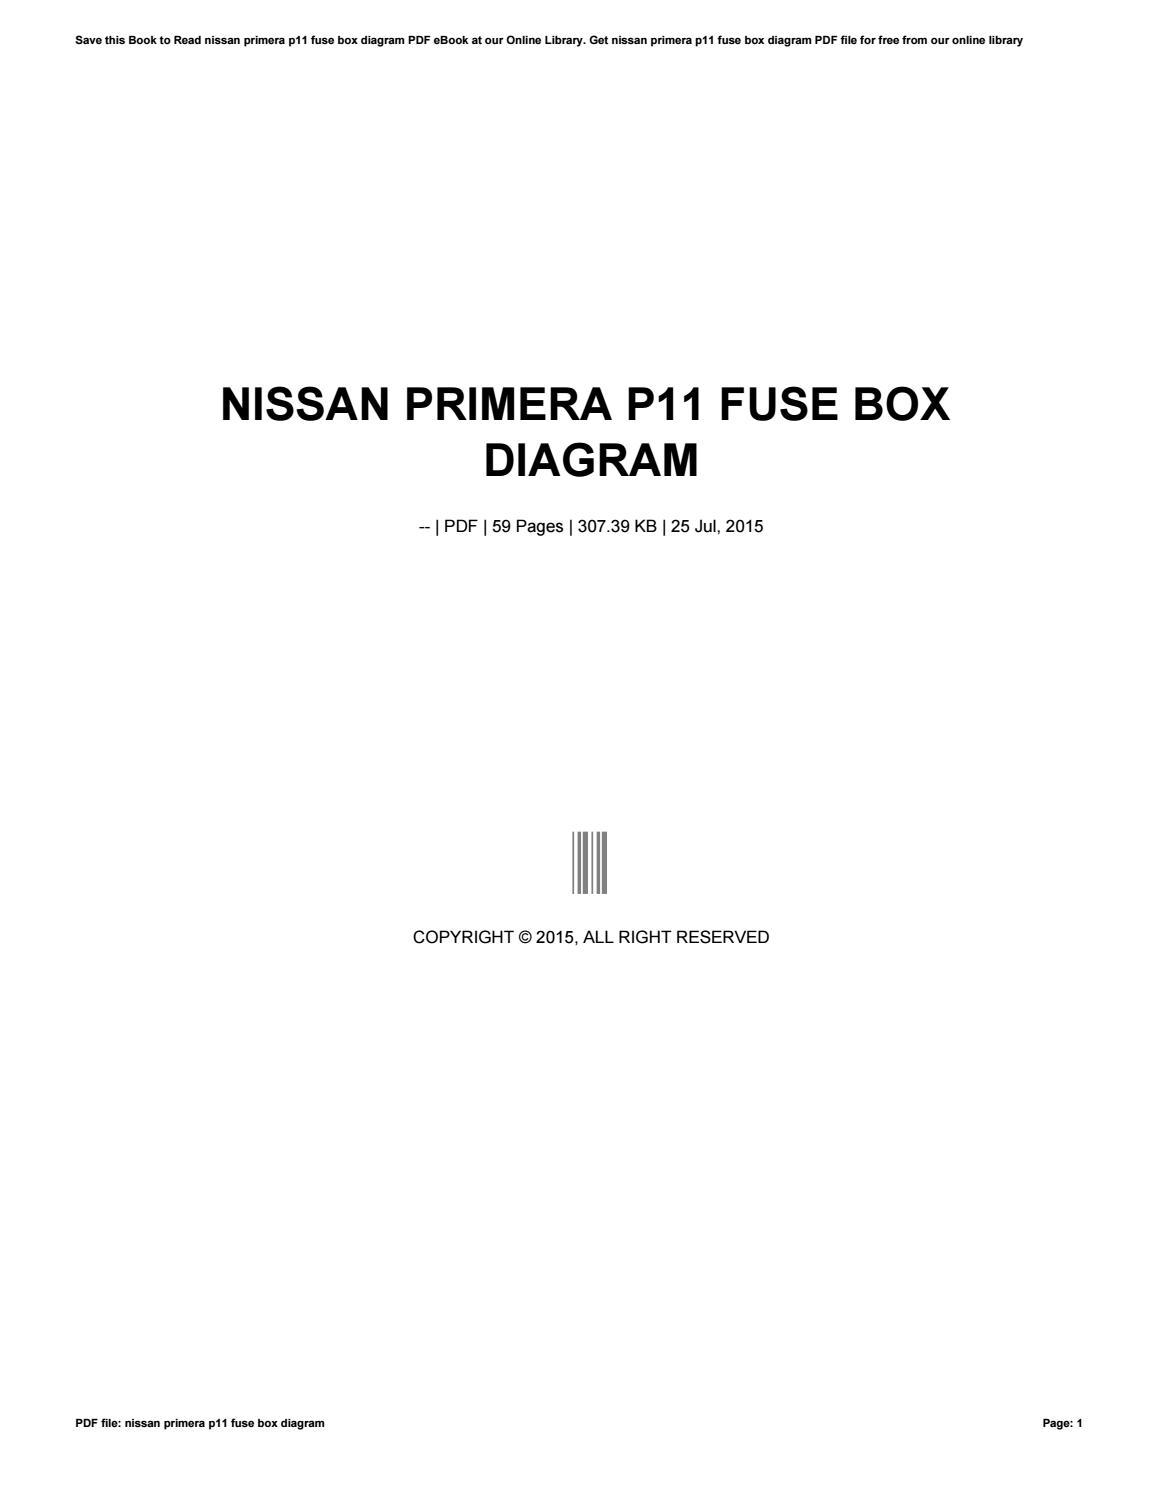 nissan primera p11 fuse box diagram by mankyrecords84 - issuu  issuu